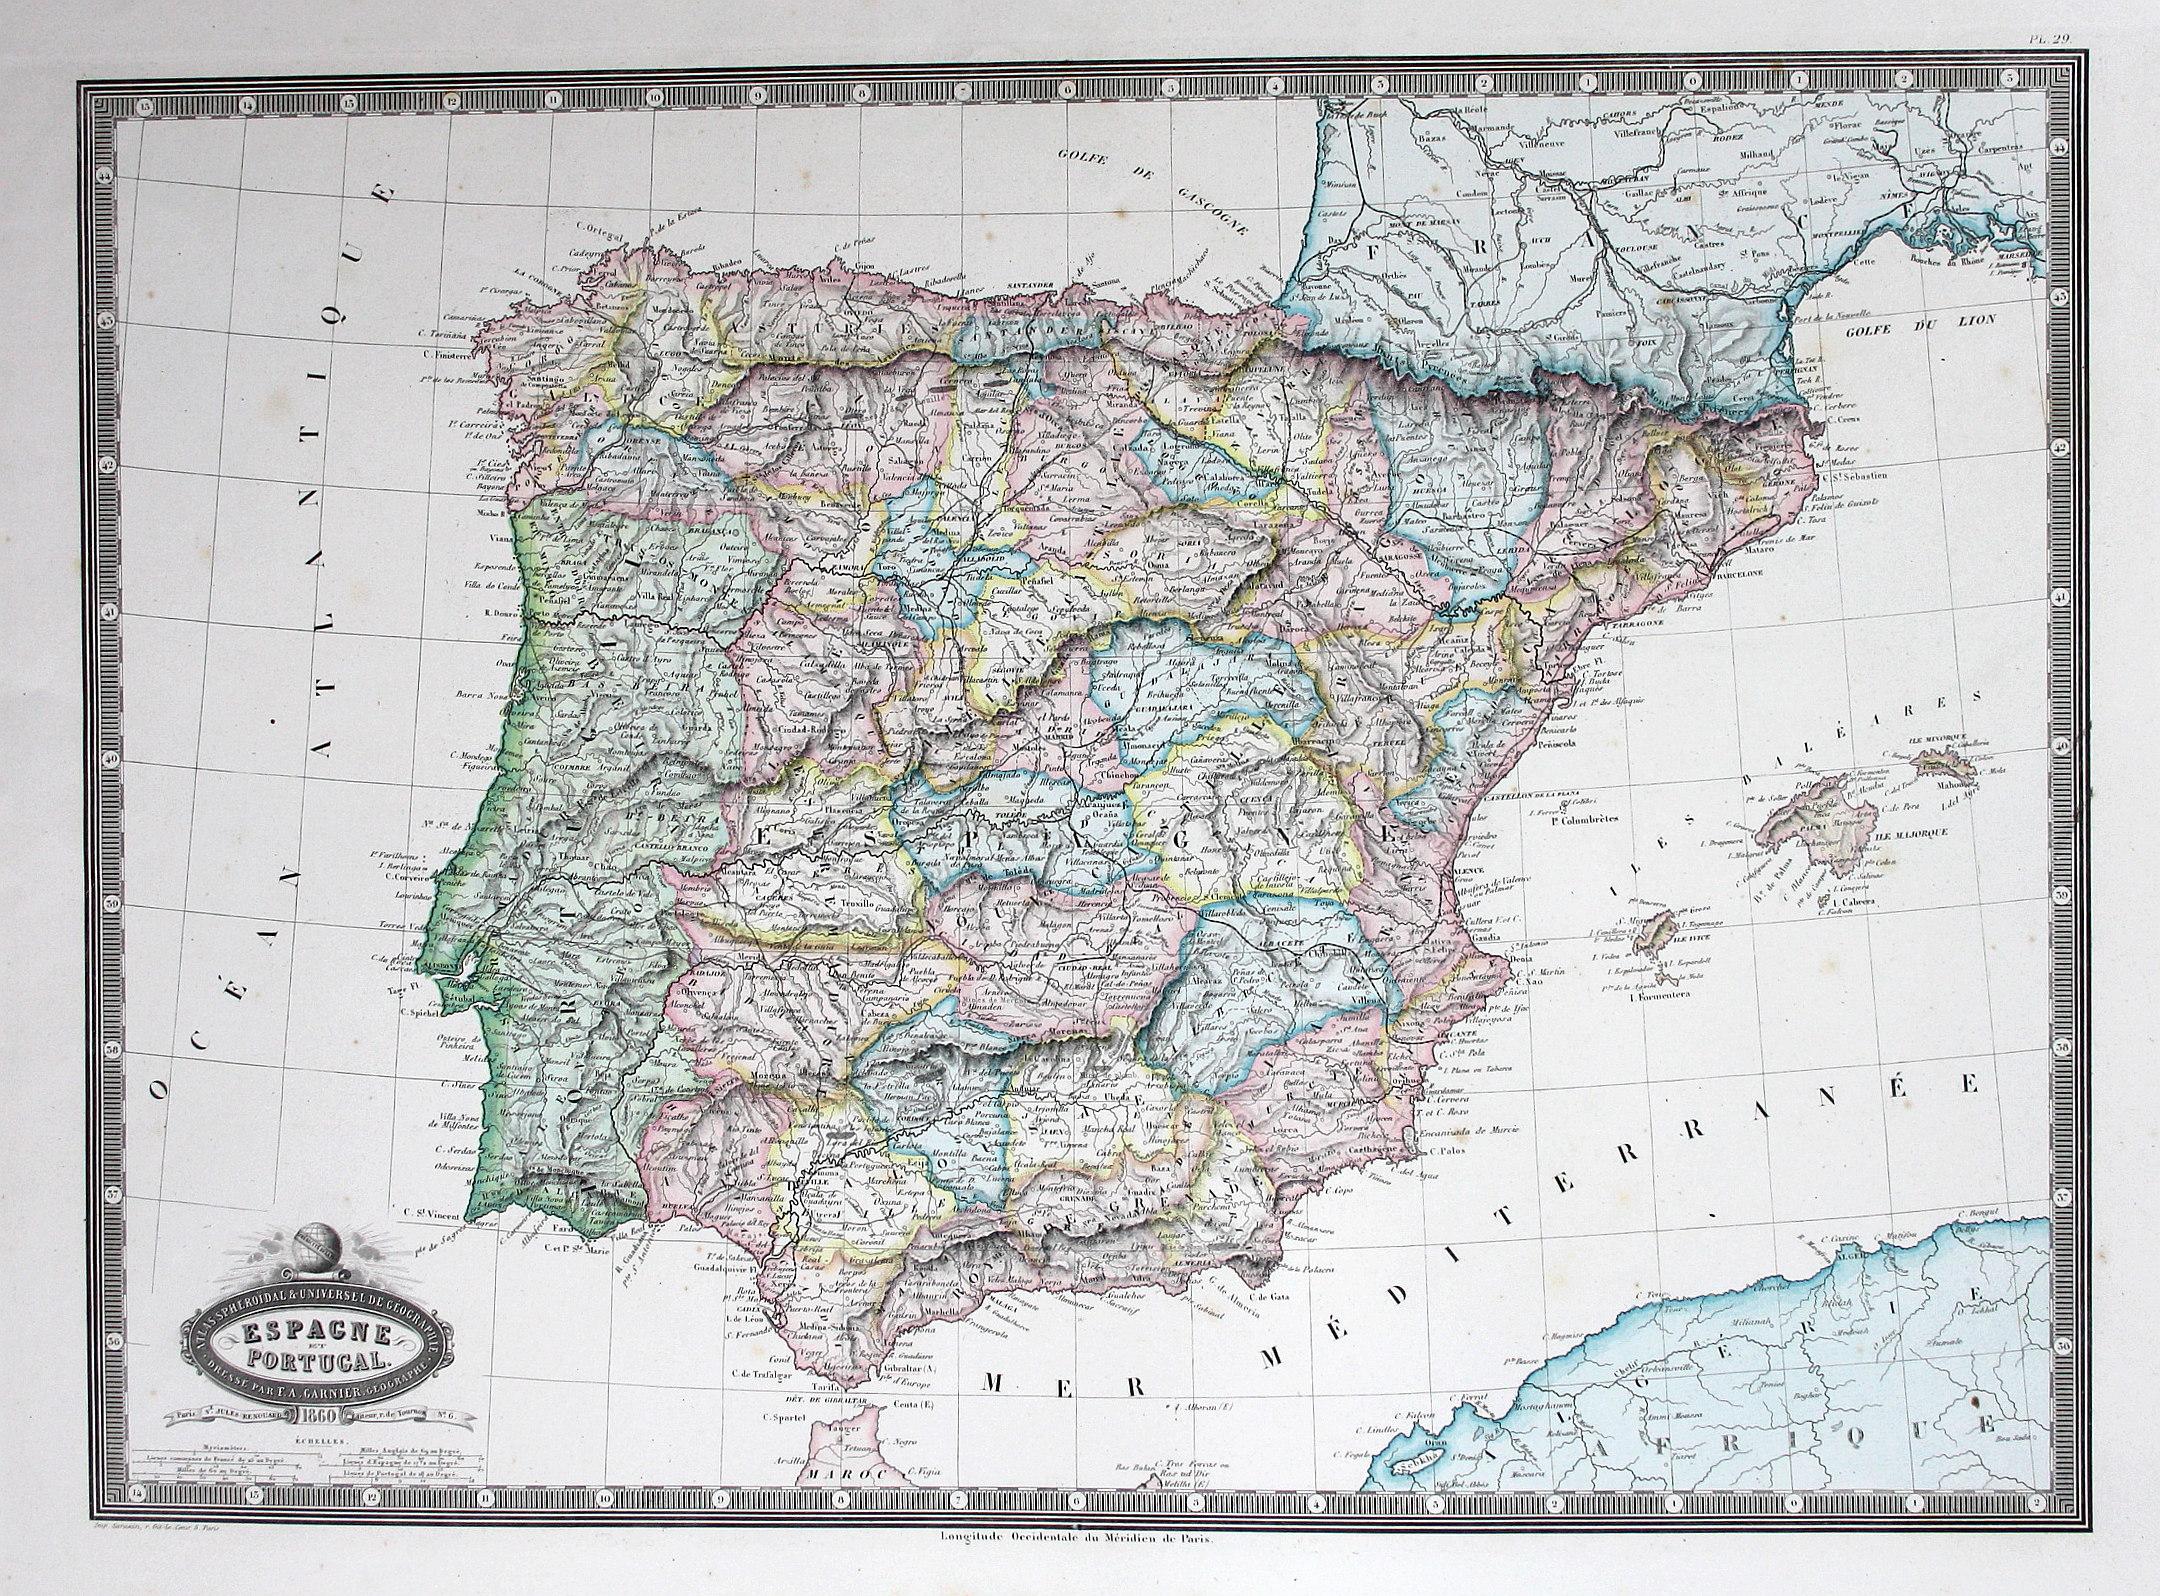 Espagne et Portugal\